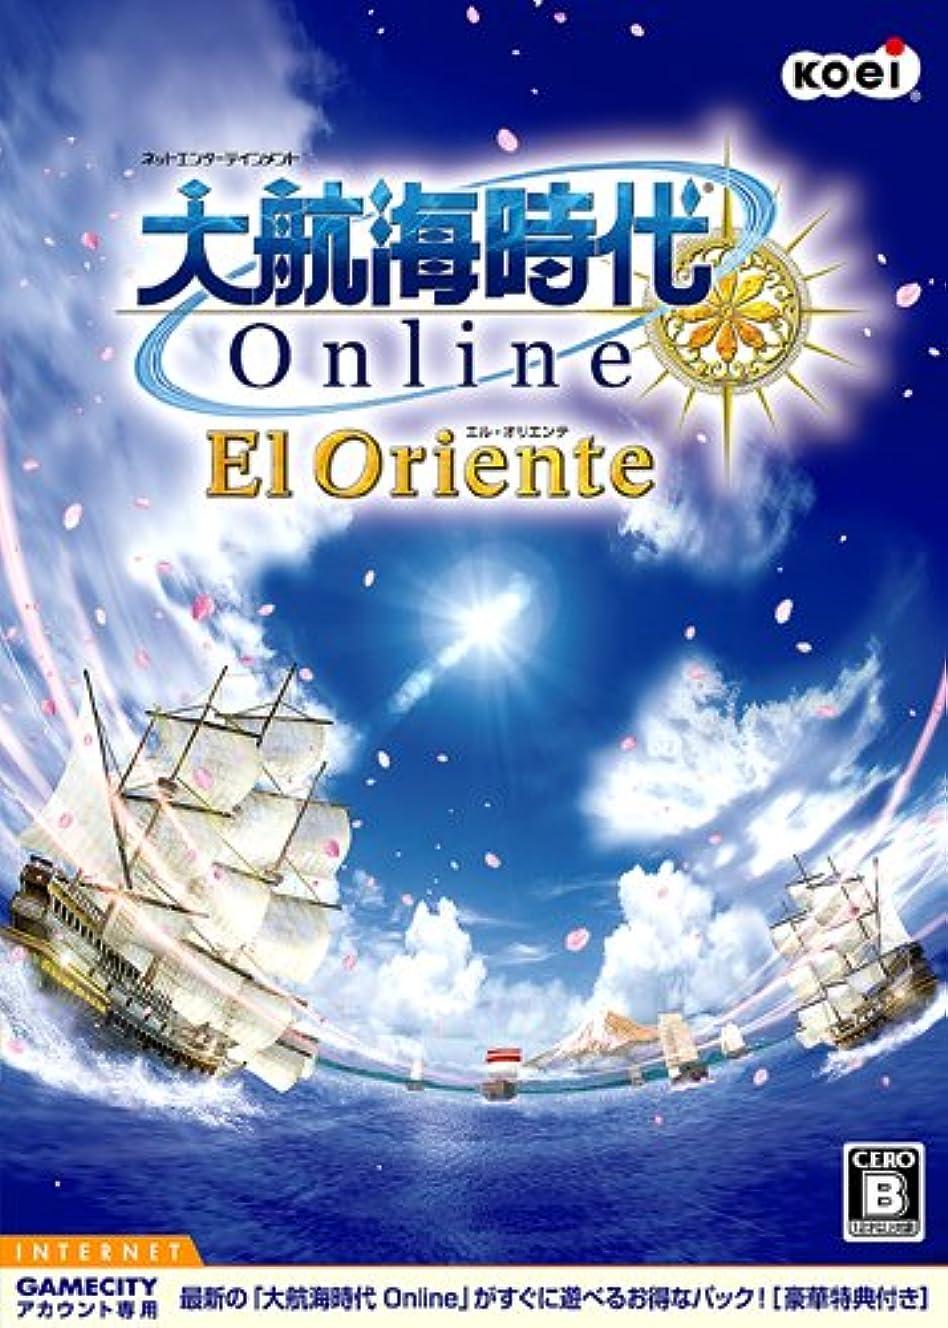 反対保有者汚れた大航海時代 Online ~El Oriente~